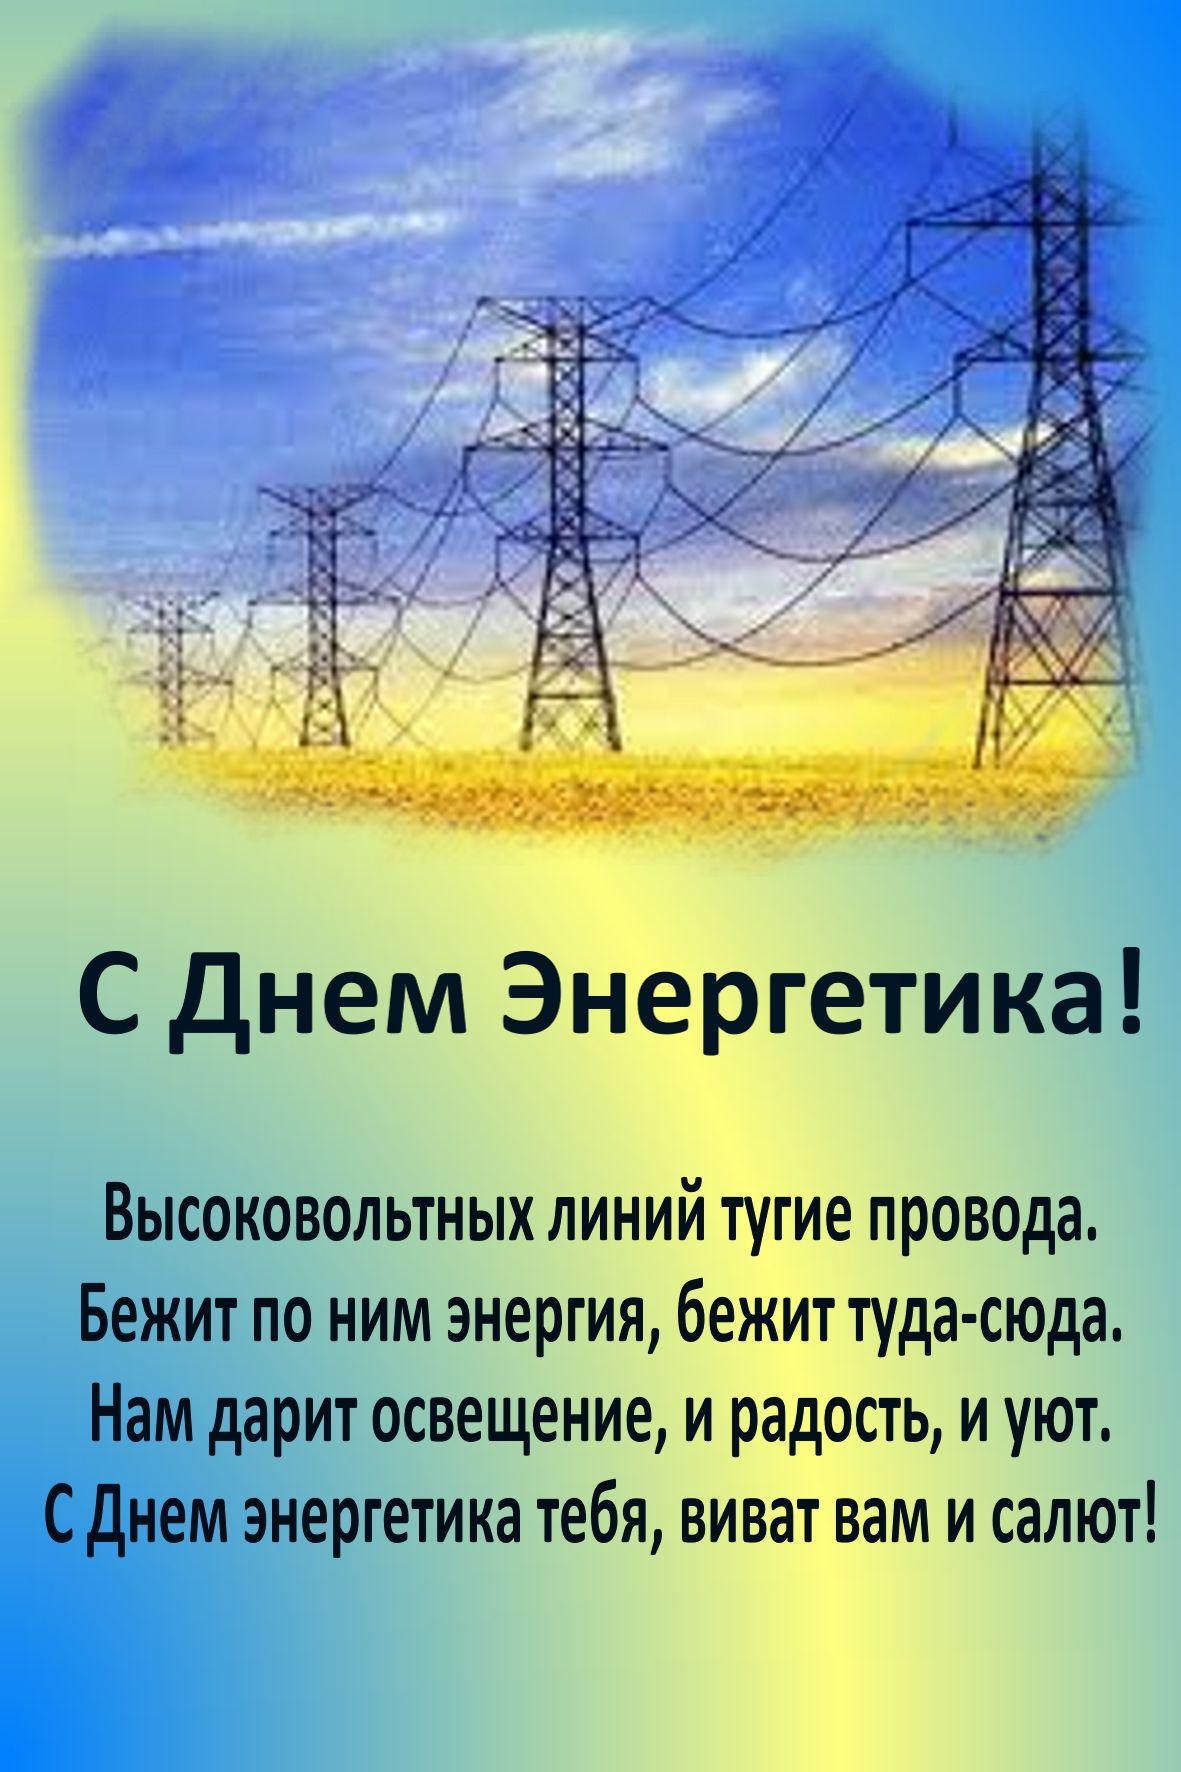 Картинки и открытки ко дню энергетика